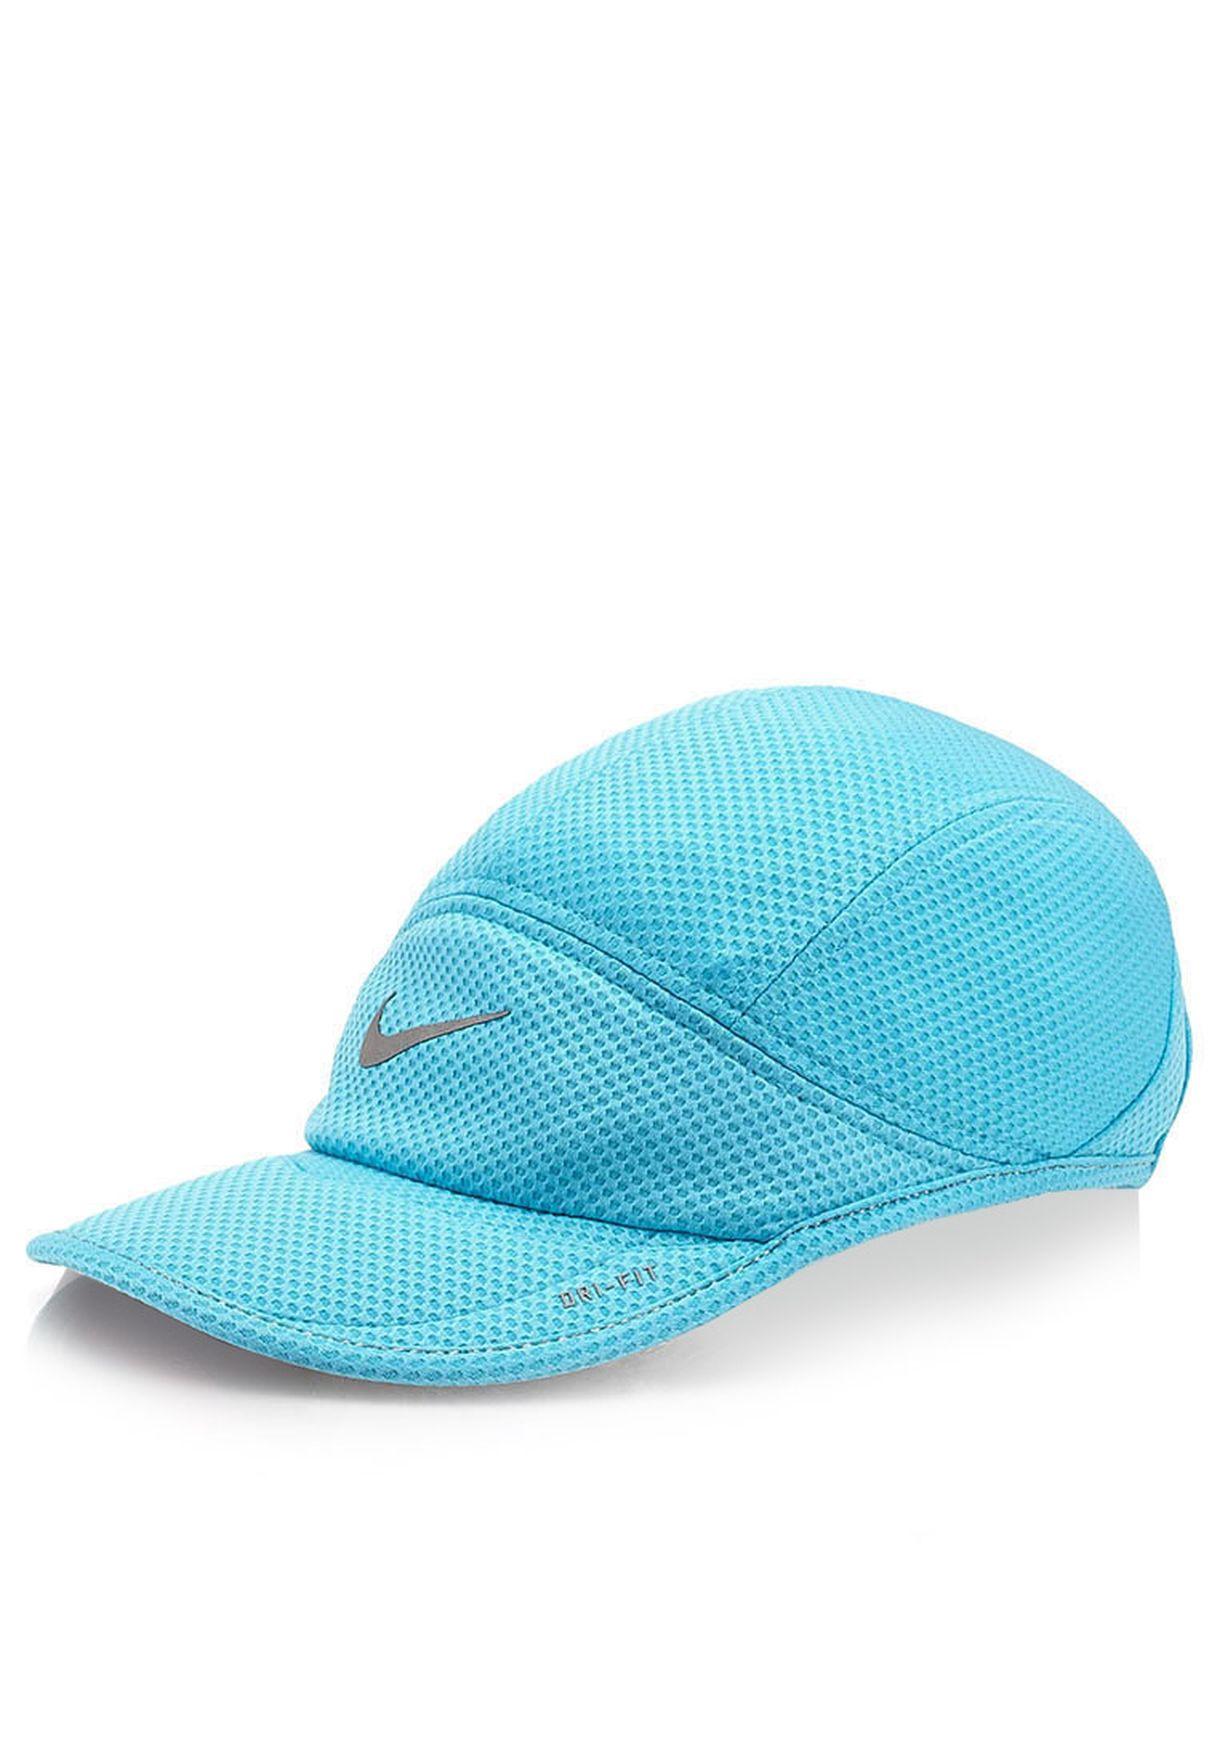 668a4a81141 Shop Nike blue Mesh Daybreak Cap NKAP520787-442 for Men in Bahrain -  NI727AC31XHK